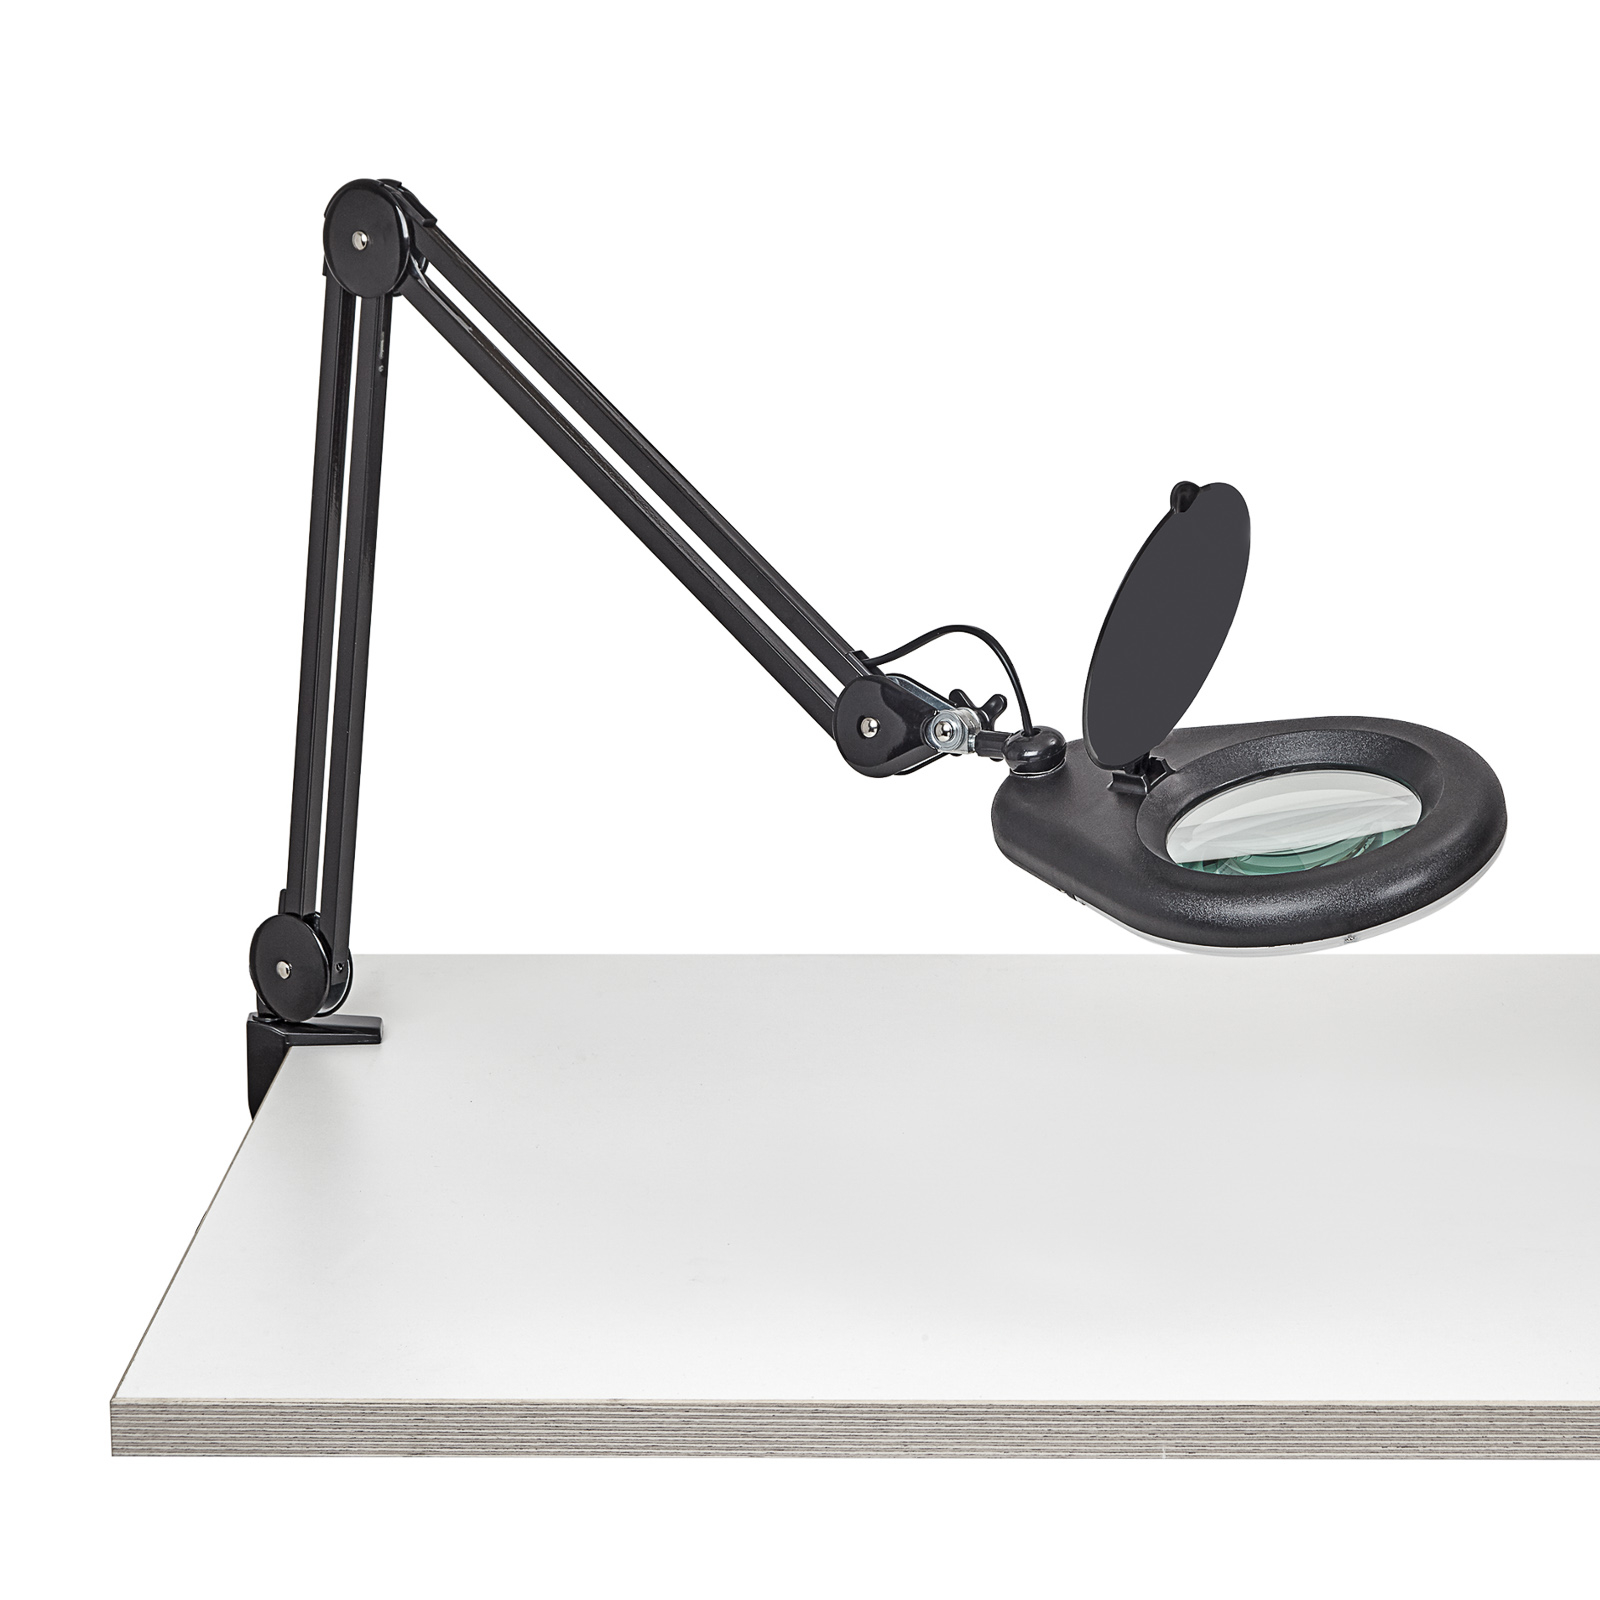 MAULviso LED-luplys med klemme, sort